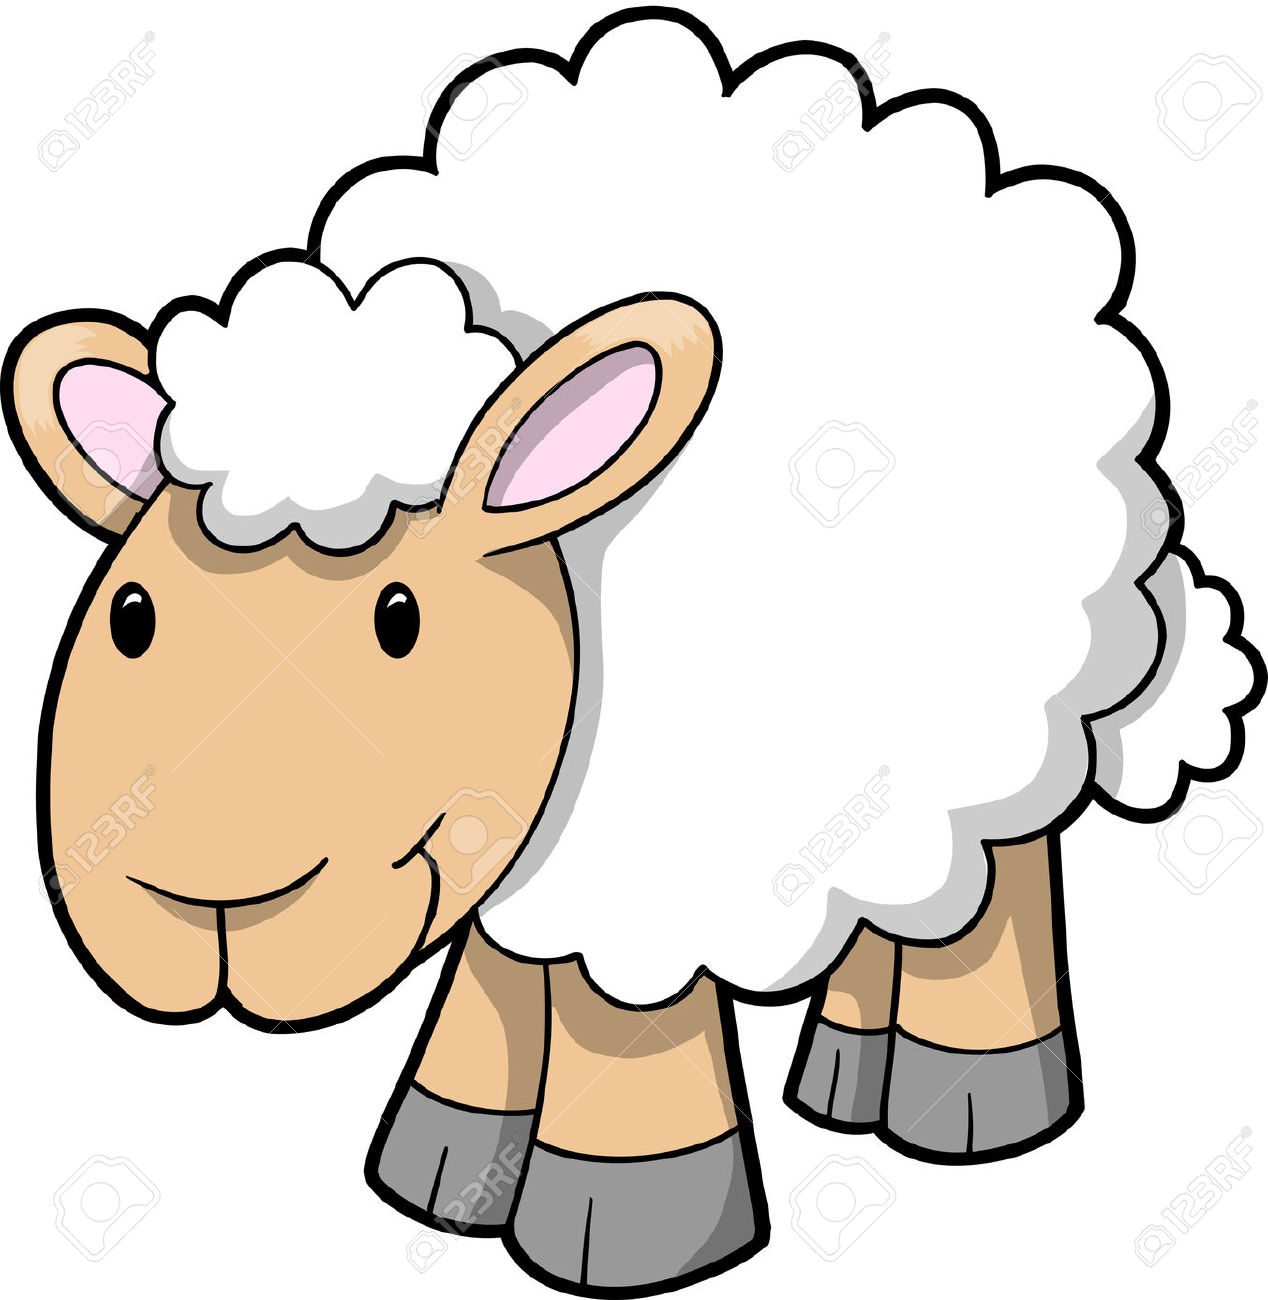 Lamb clipart cartoon. Top sheep free image